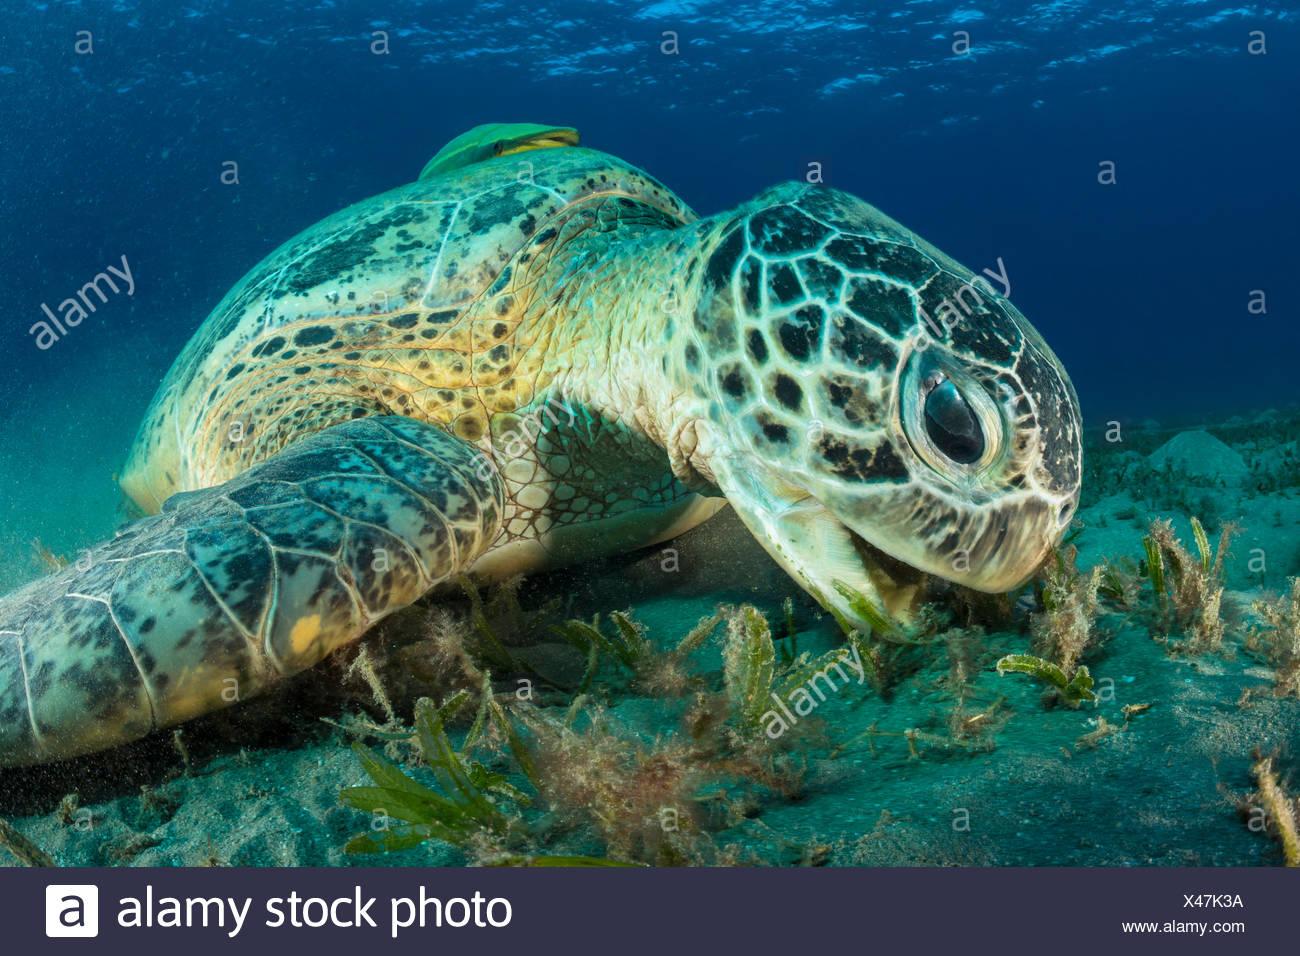 Feeding Green Sea Turtle, Chelonia mydas, Marsa Alam, Red Sea, Egypt - Stock Image